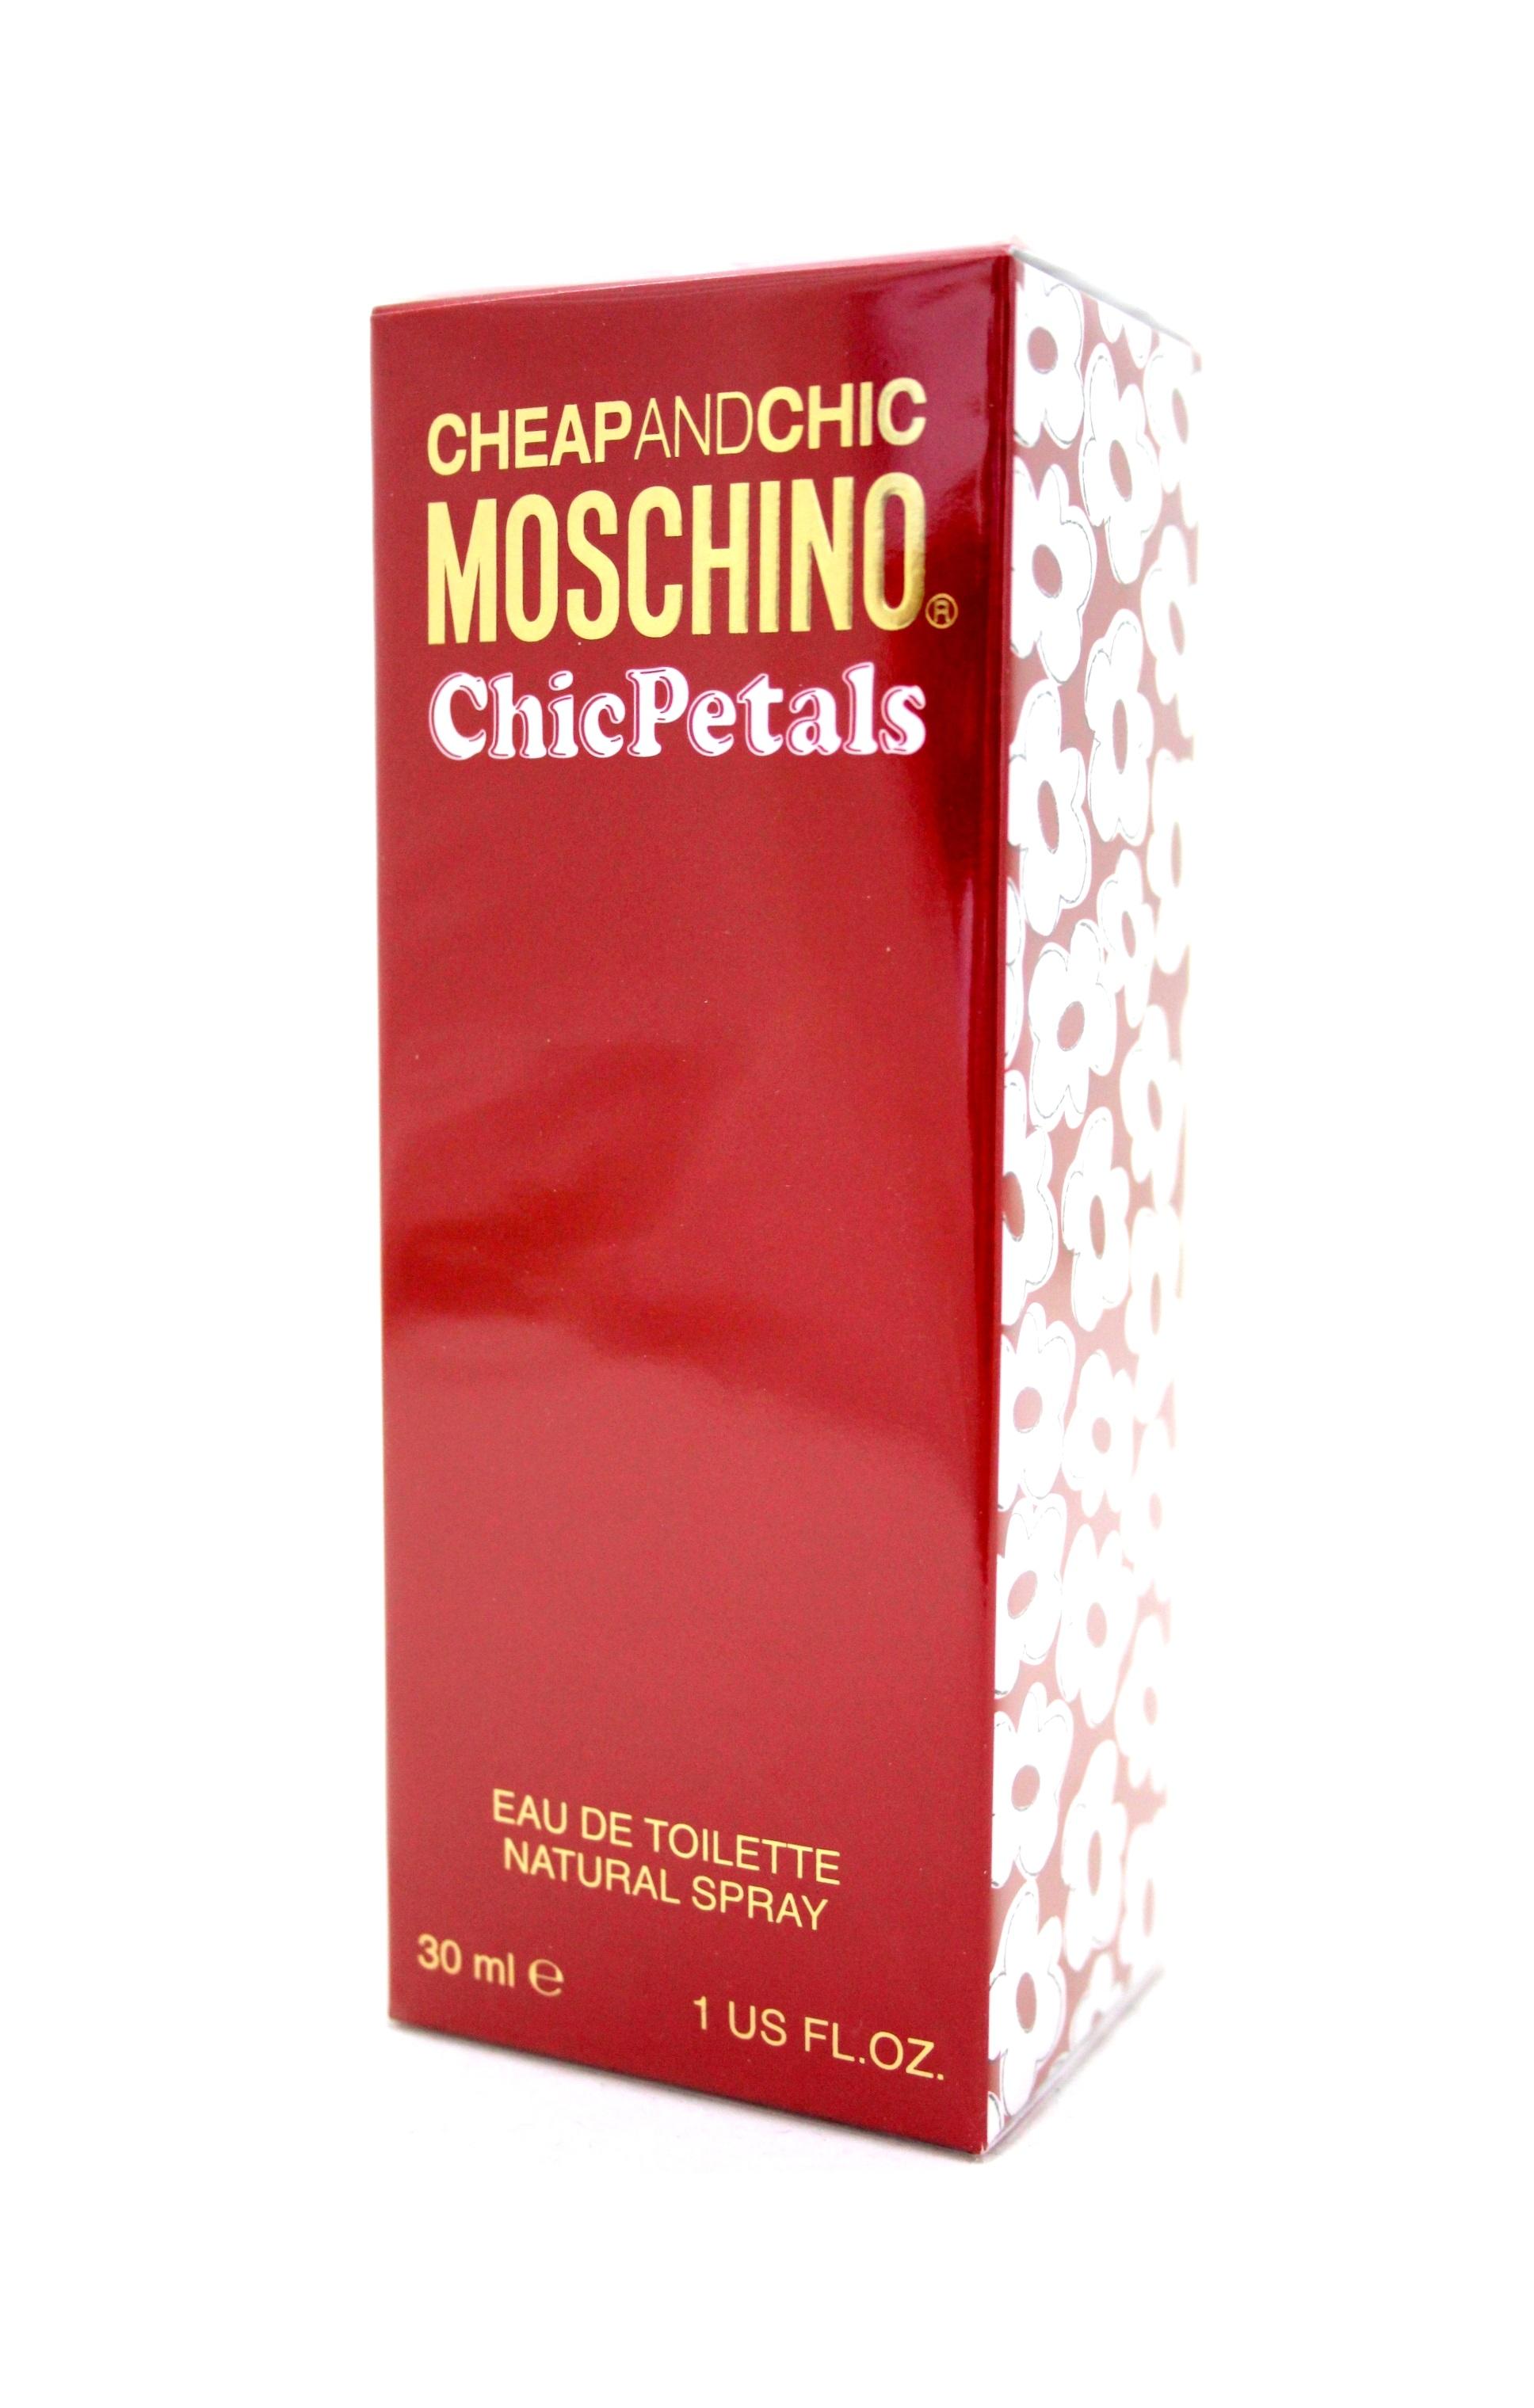 Moschino Cheap and Chic Chic Petals Eau de Toilette